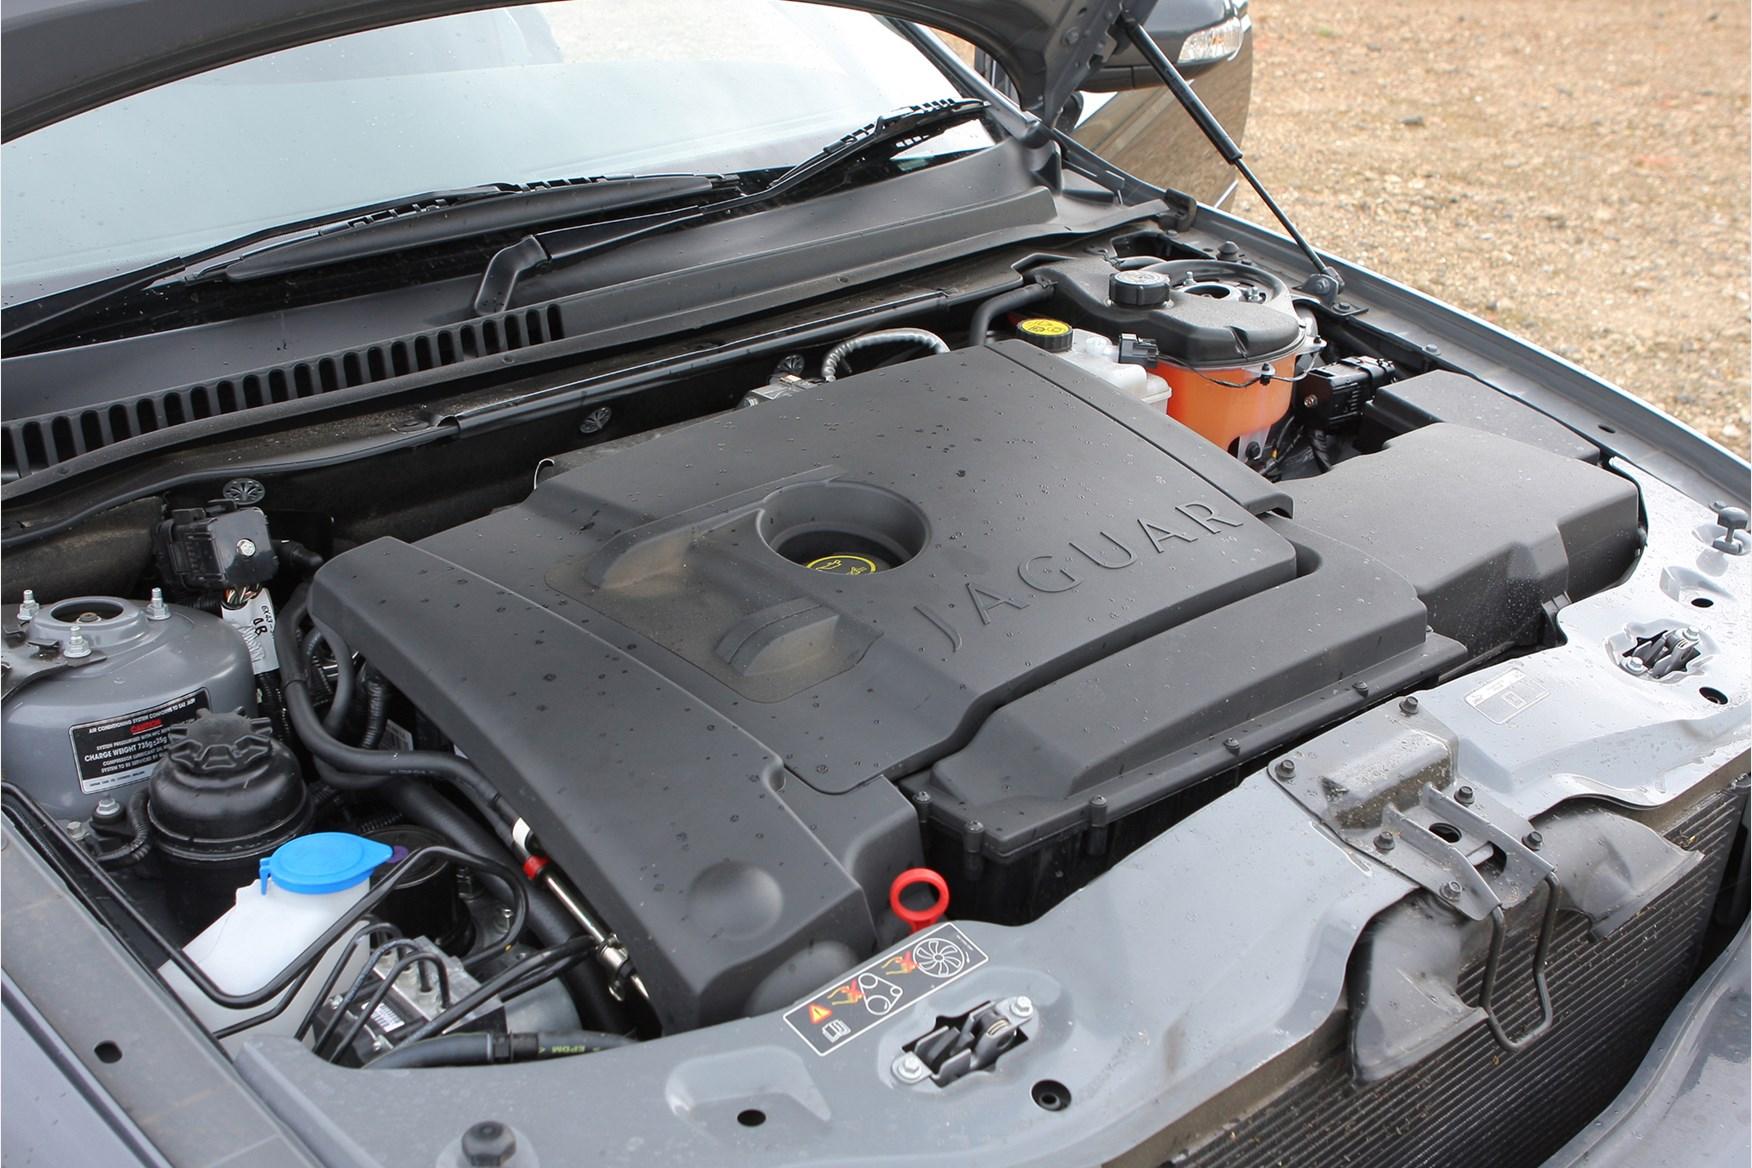 jaguar s type engine failsafe mode  jaguar  free engine